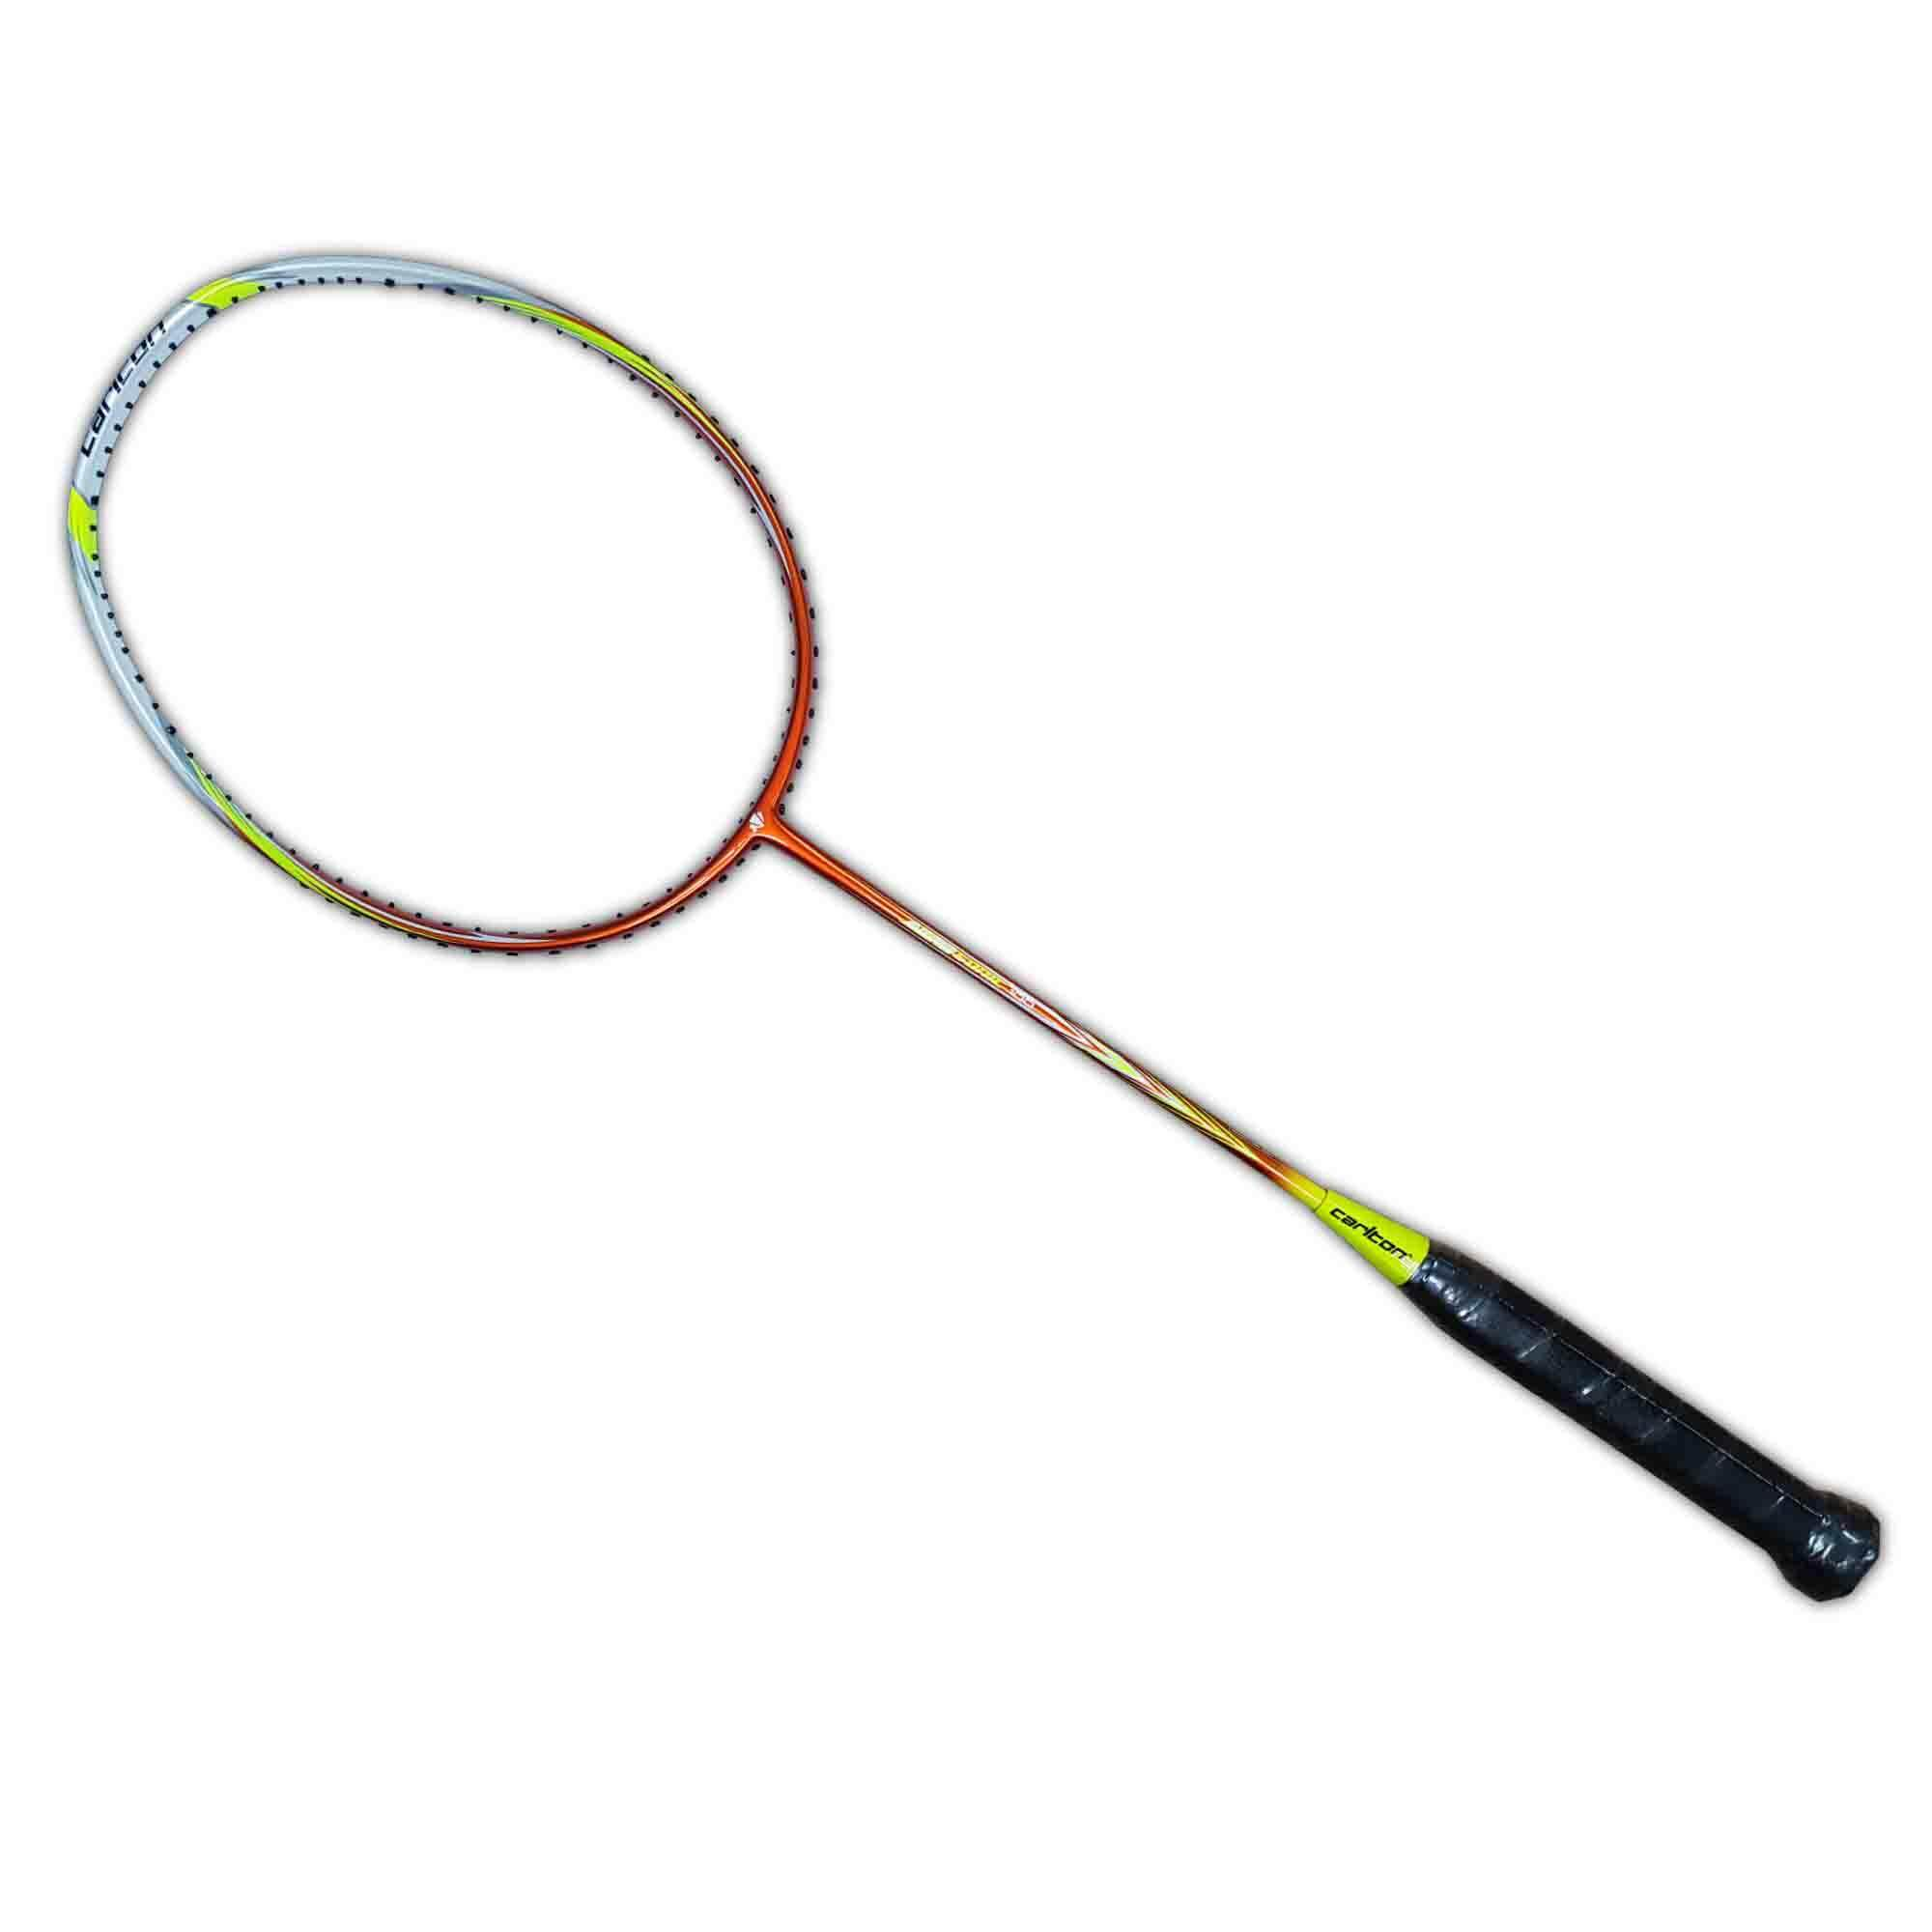 Carlton Badminton Racket Aerosonic 100